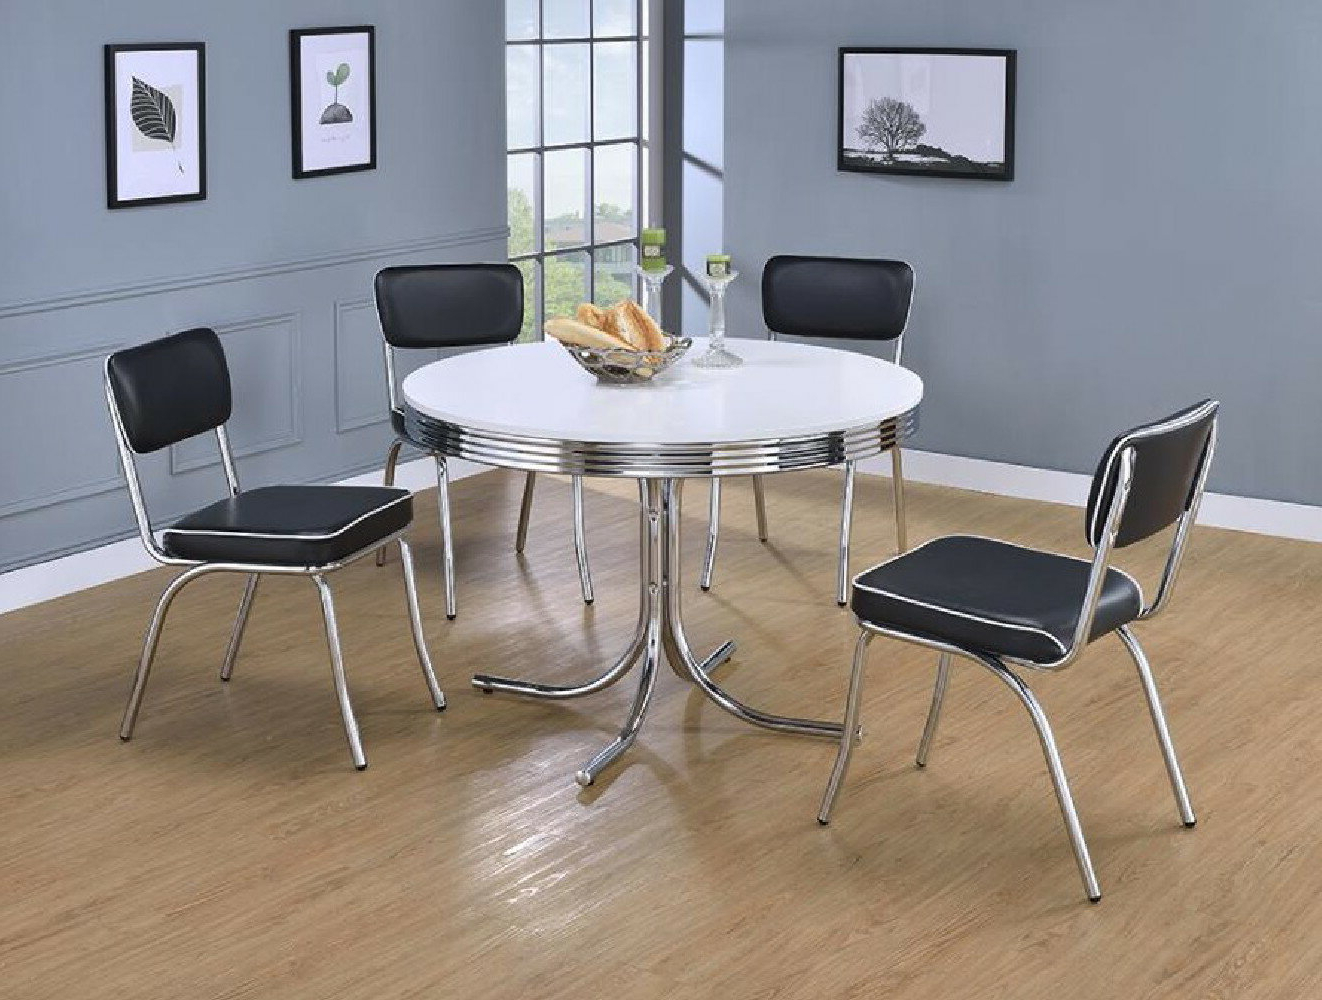 Latest Lillard 3 Piece Breakfast Nook Dining Sets Inside Orren Ellis Yother 5 Piece Dining Set (View 7 of 25)